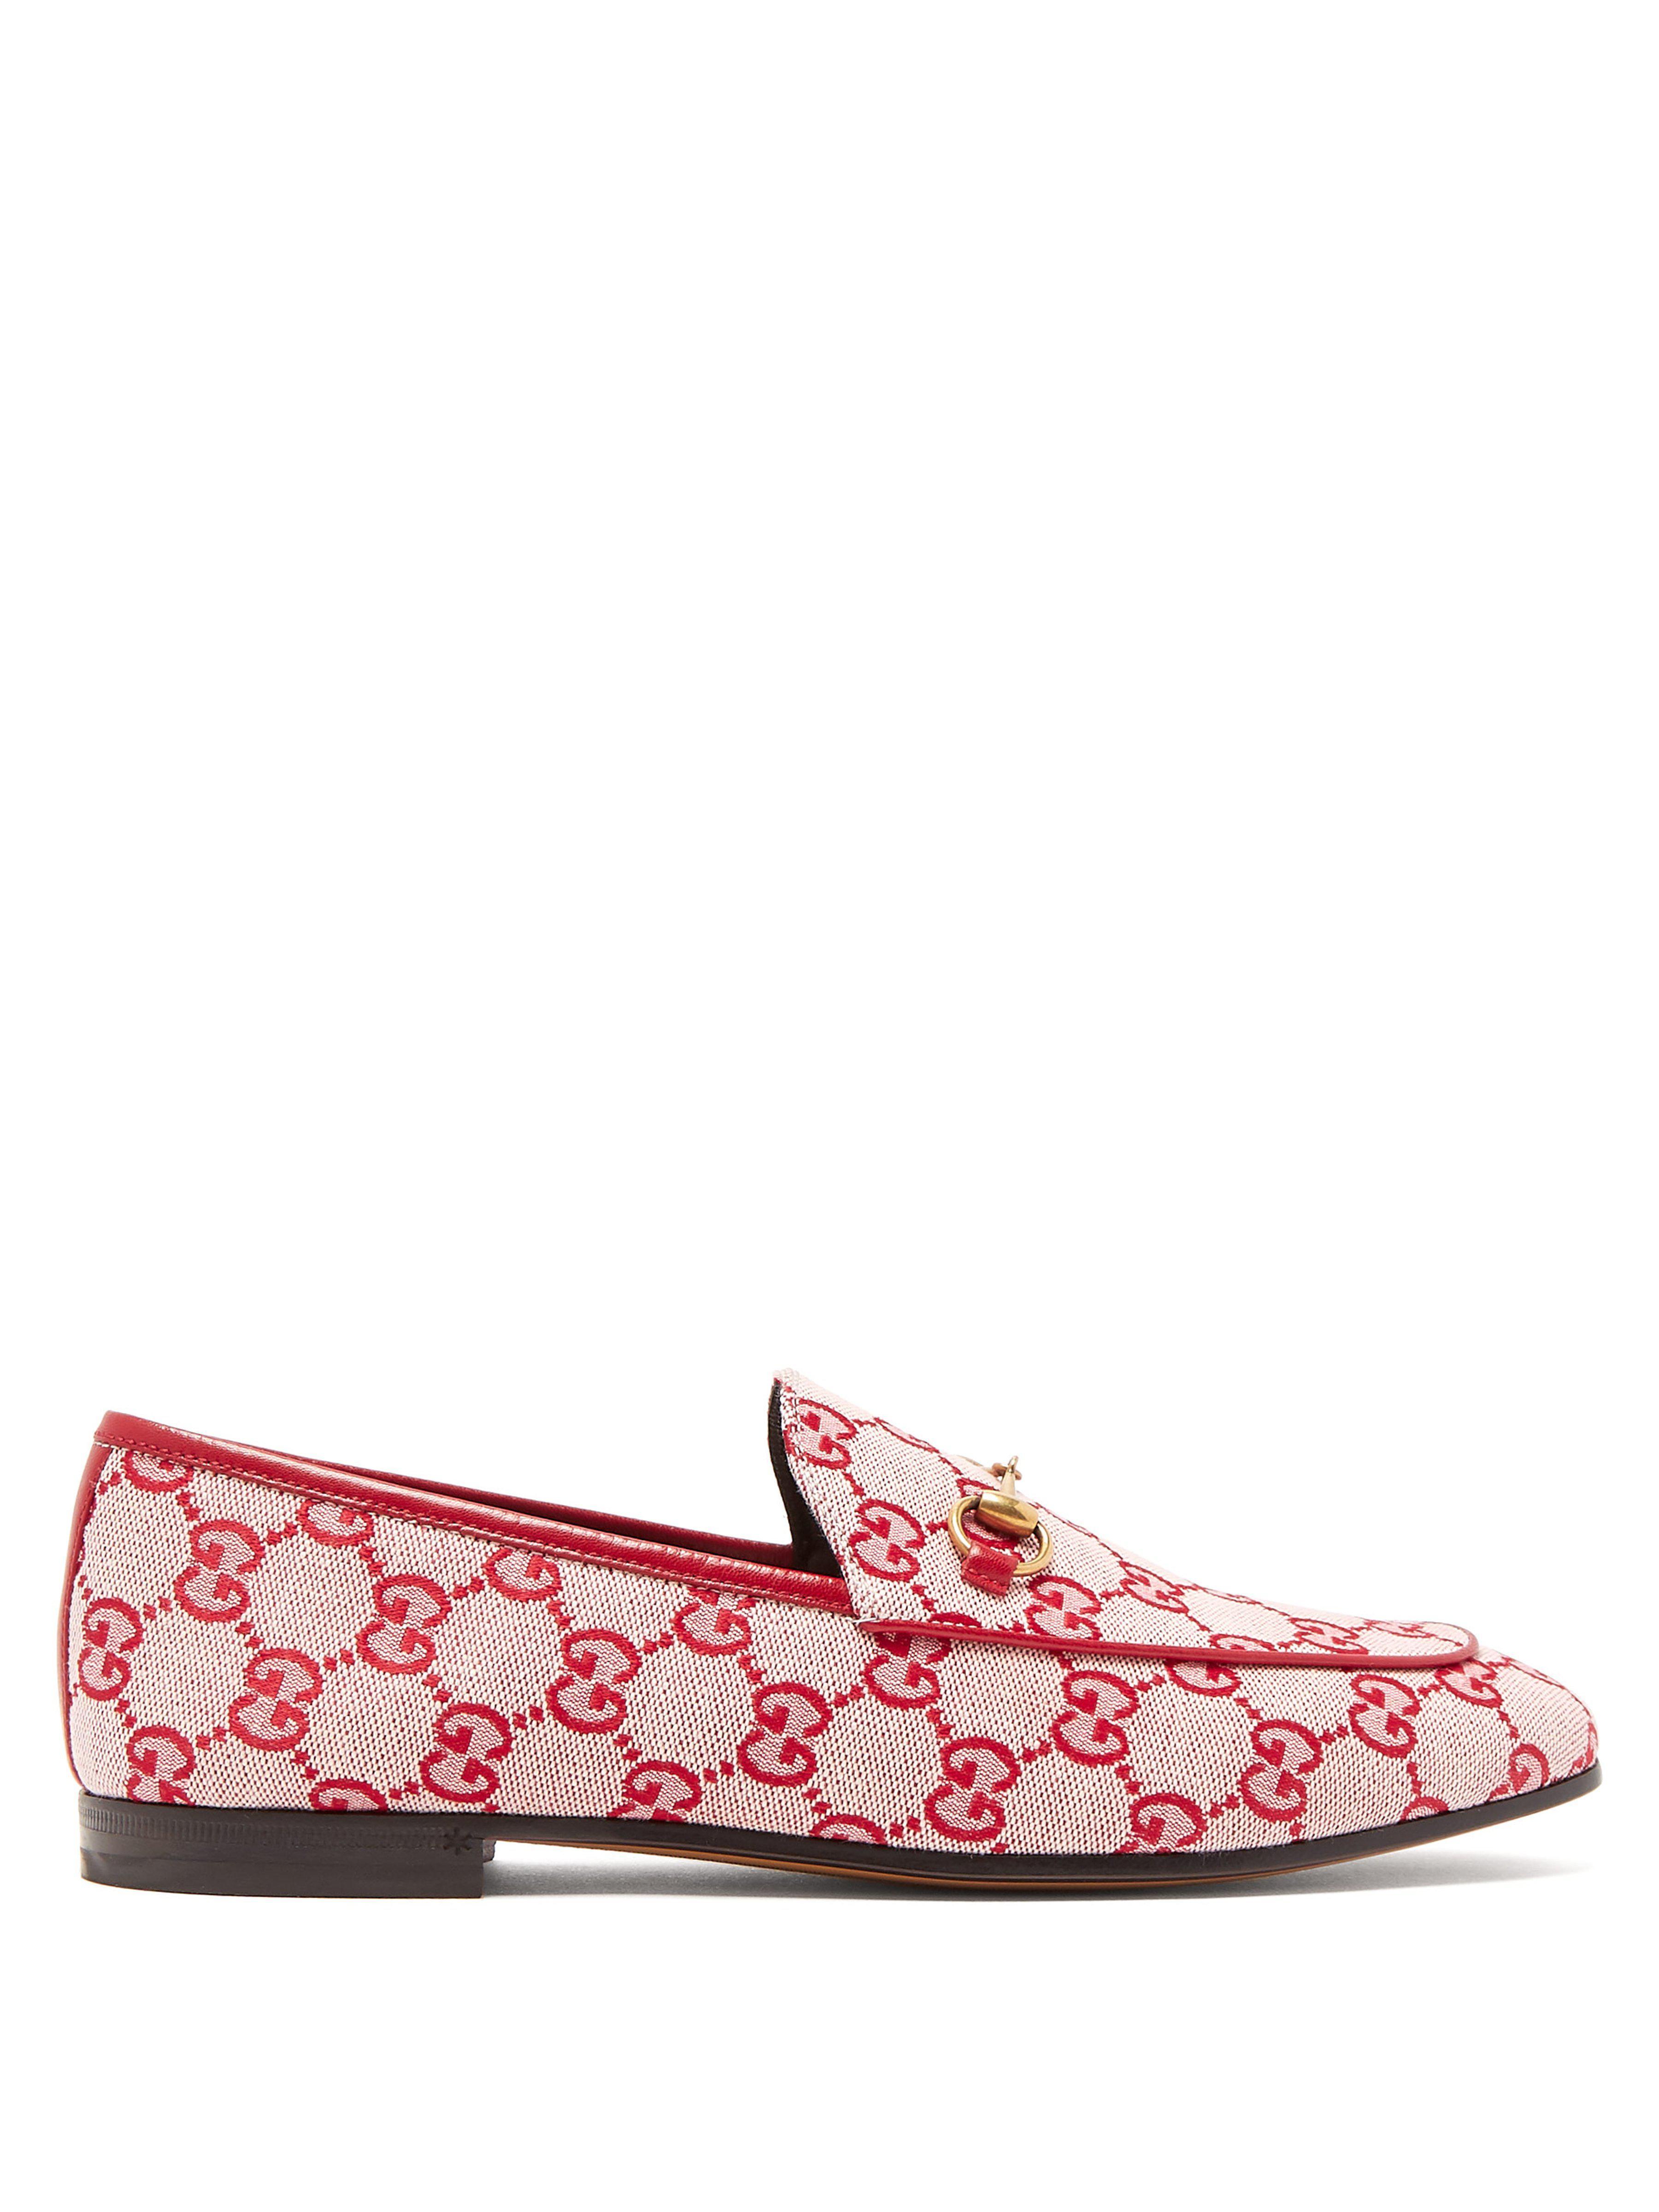 9d43155a3b1 Gucci. Women s Jordaan Logo Jacquard Loafers